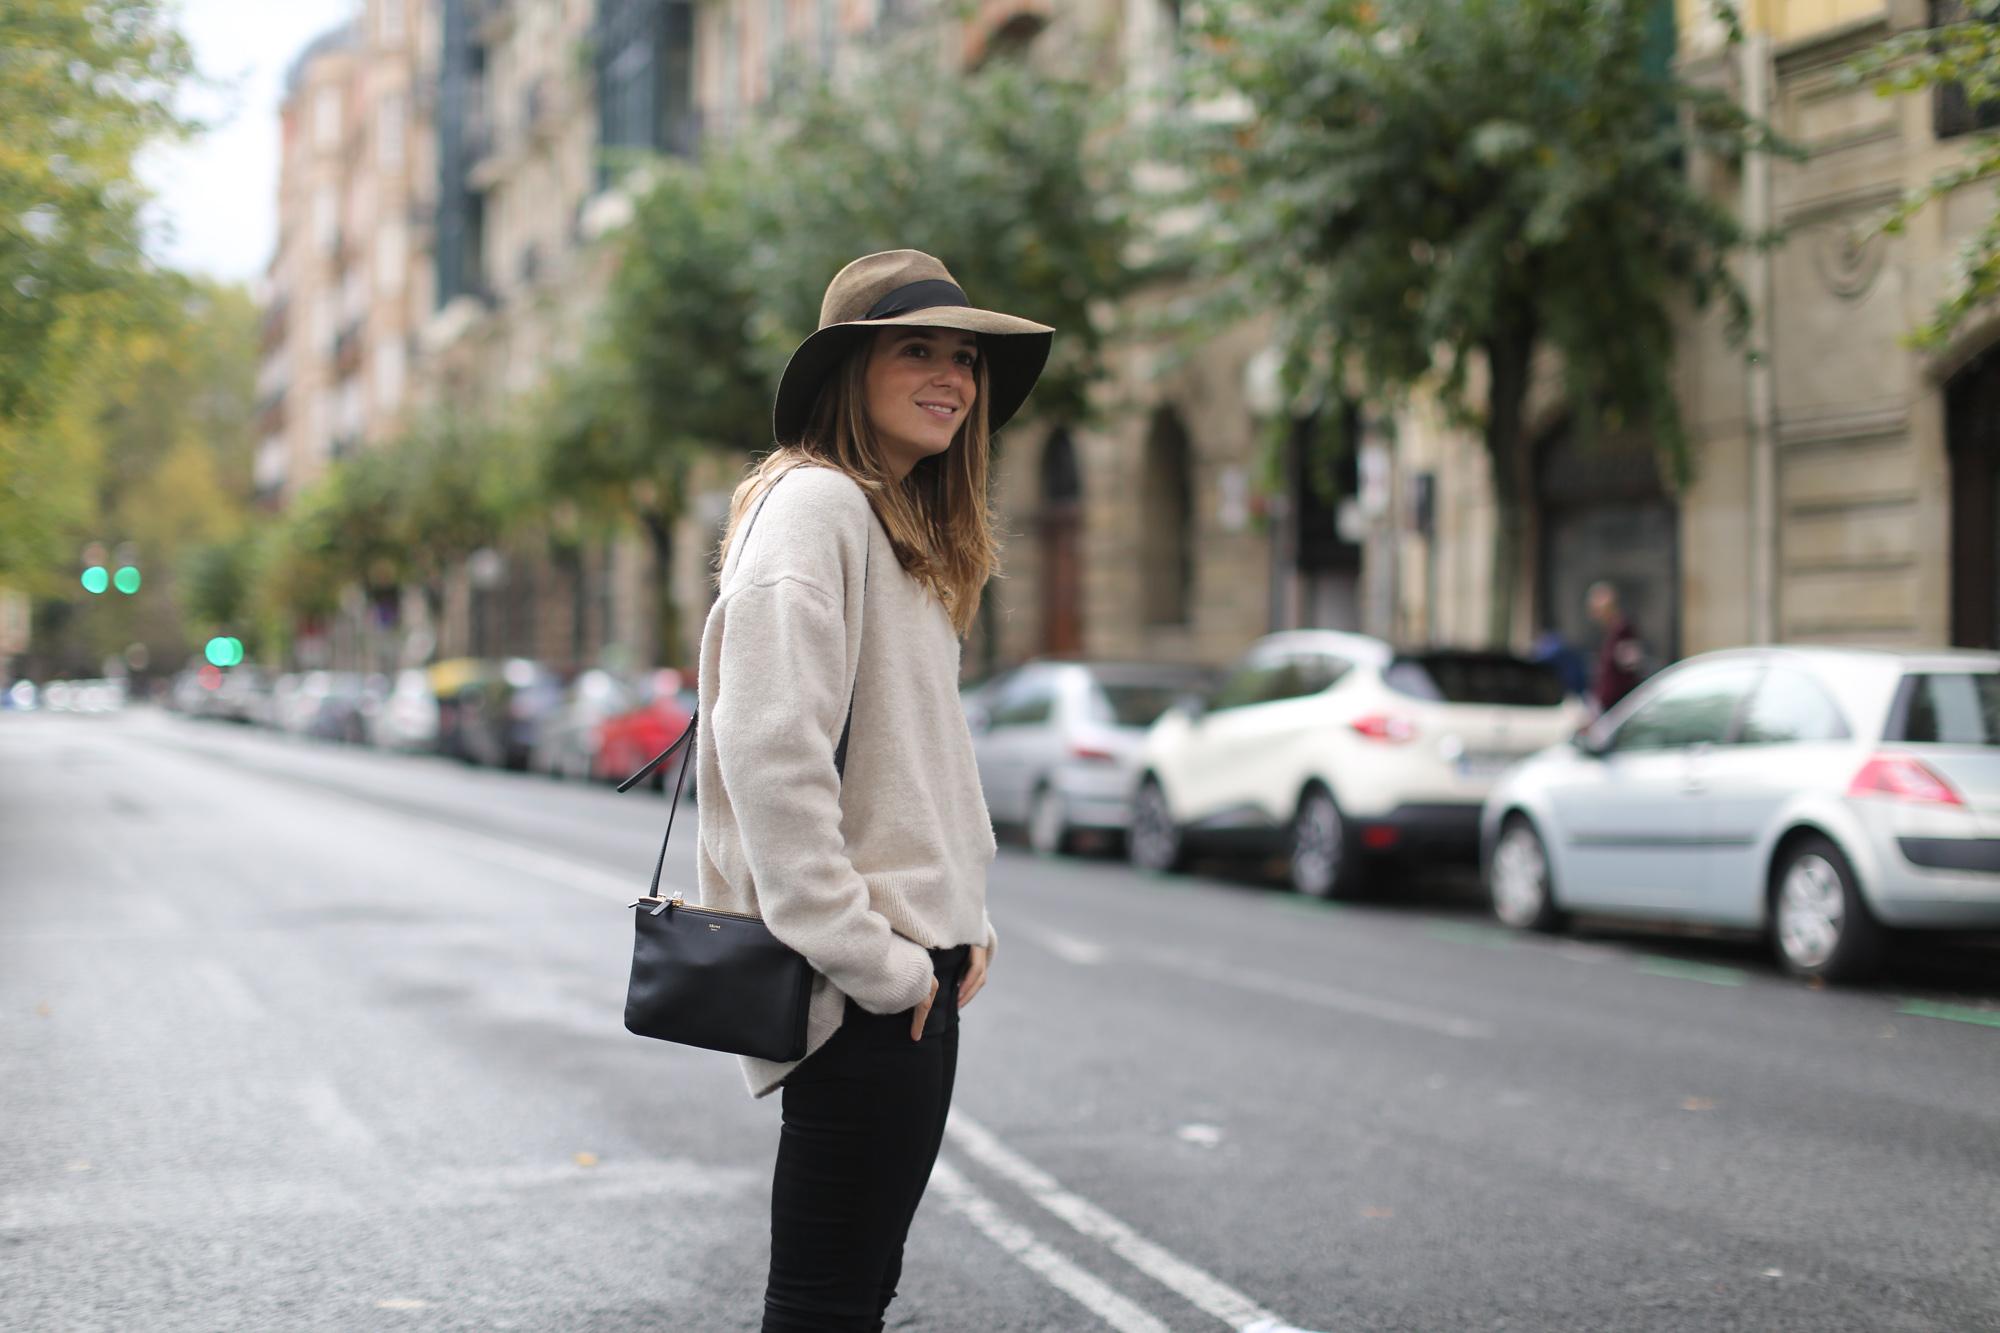 Clochet-streetstyle-celine-trio-bag-zara-oversized-knit-fedora-hat-2